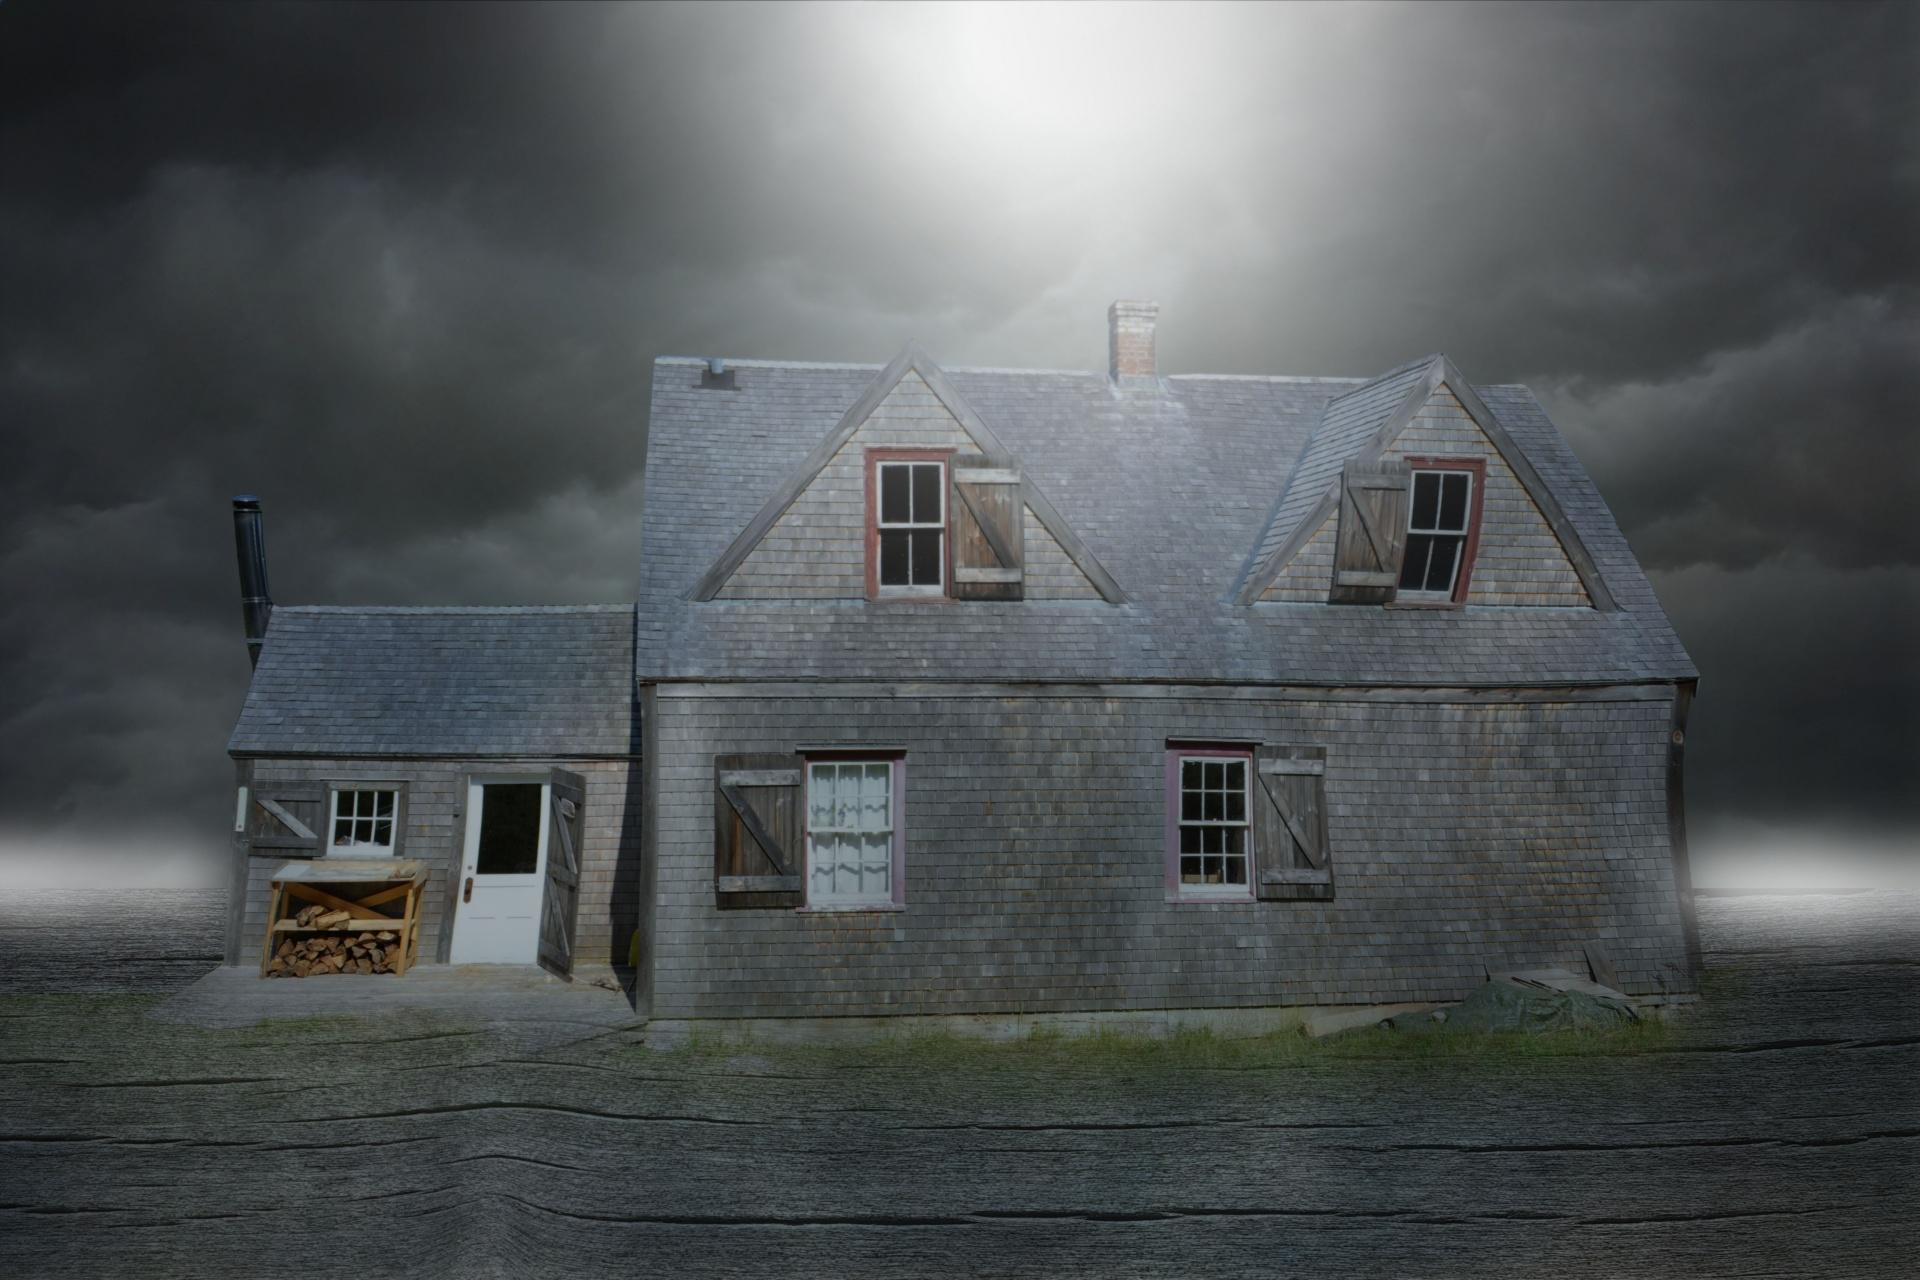 Drawn haunted house haus Public 1 Haunted Haunted House